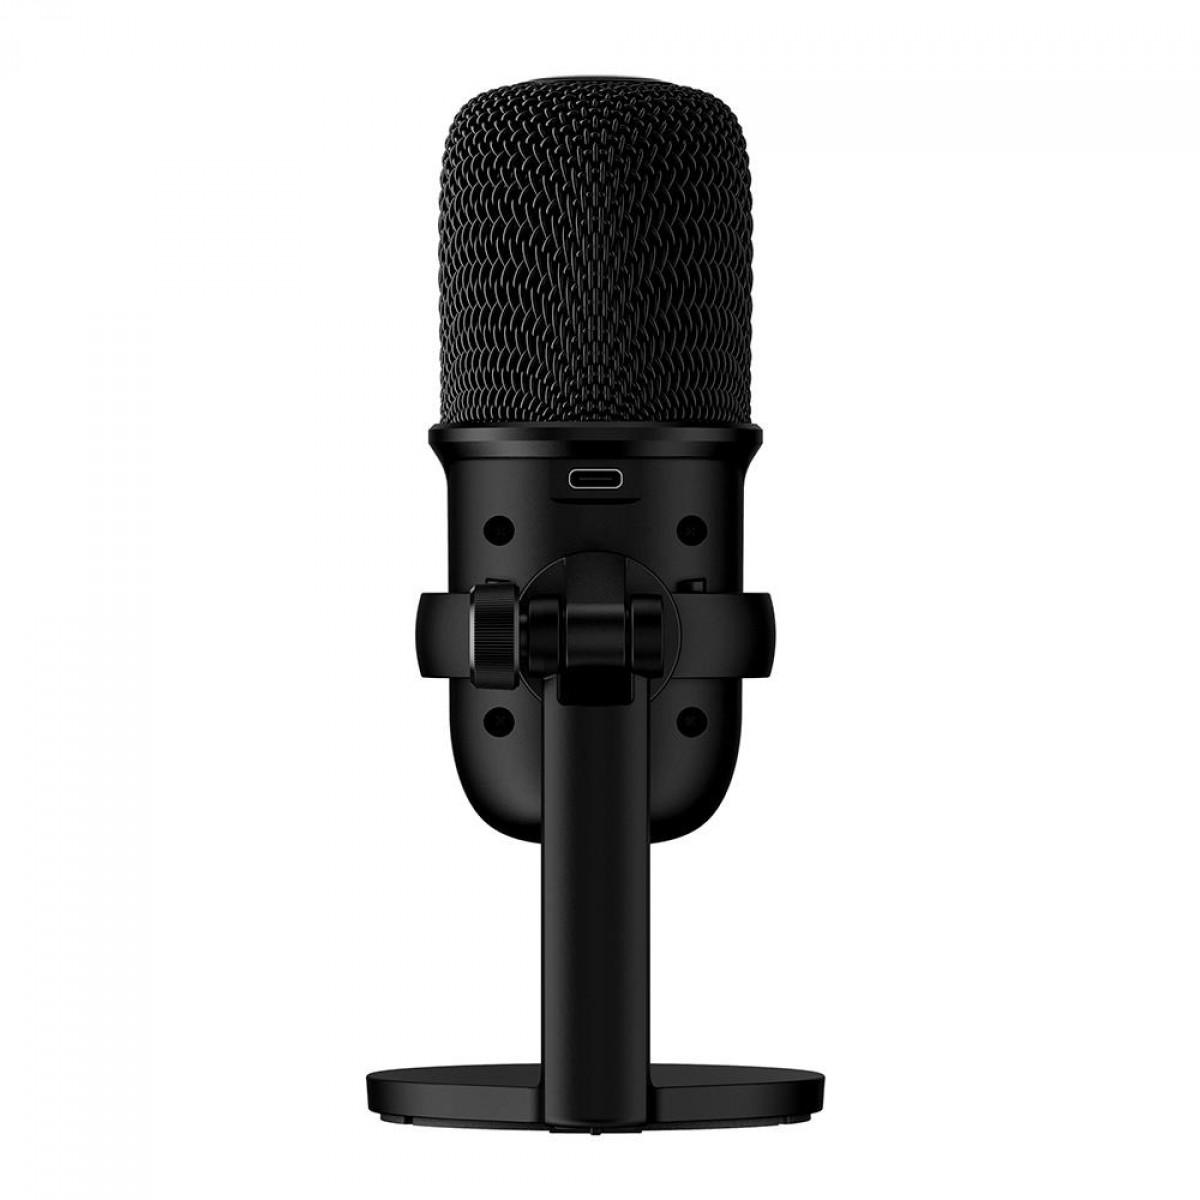 Microfone HyperX Solocast, USB, Compatível PS4, Mac, PC, HMIS1X-XX-BK/G